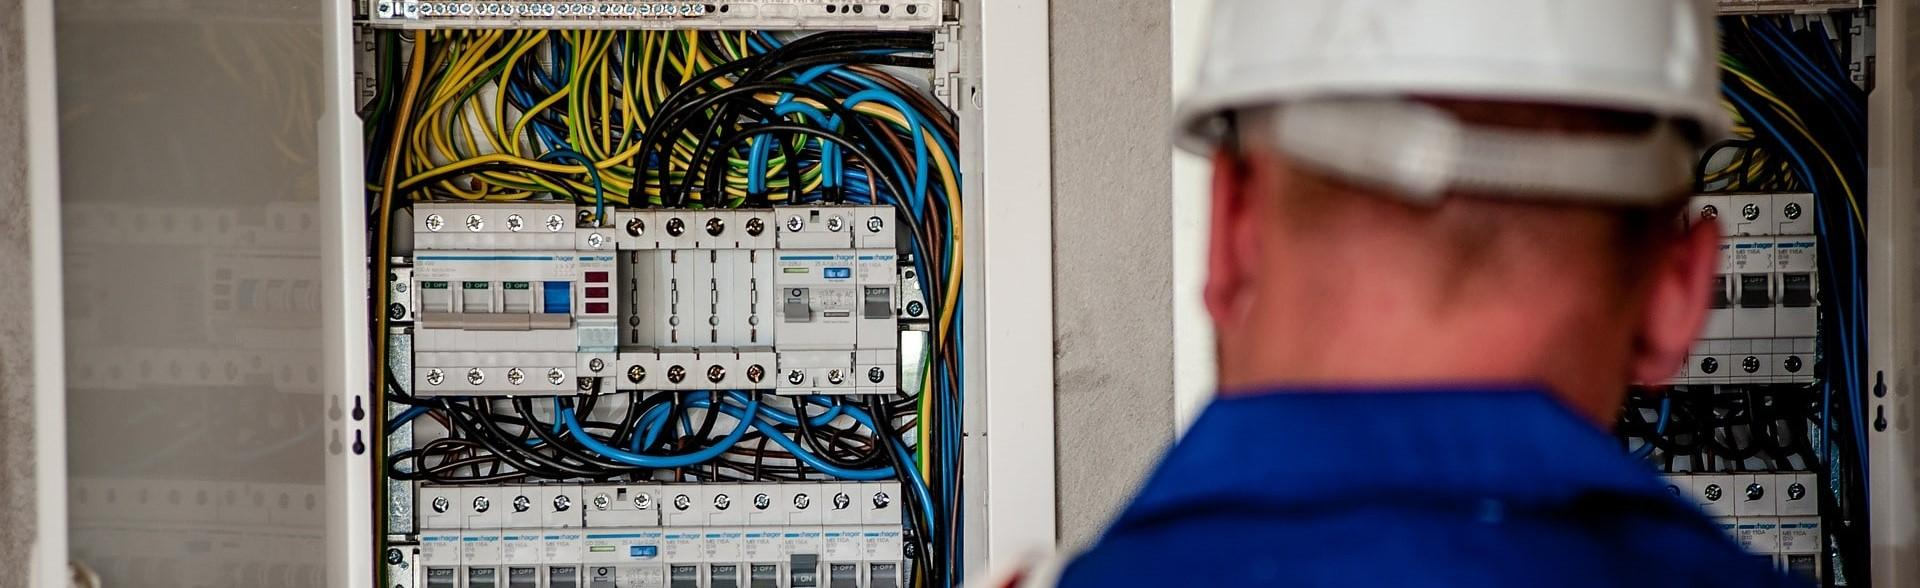 EWKC Elektriciteit - wazaa